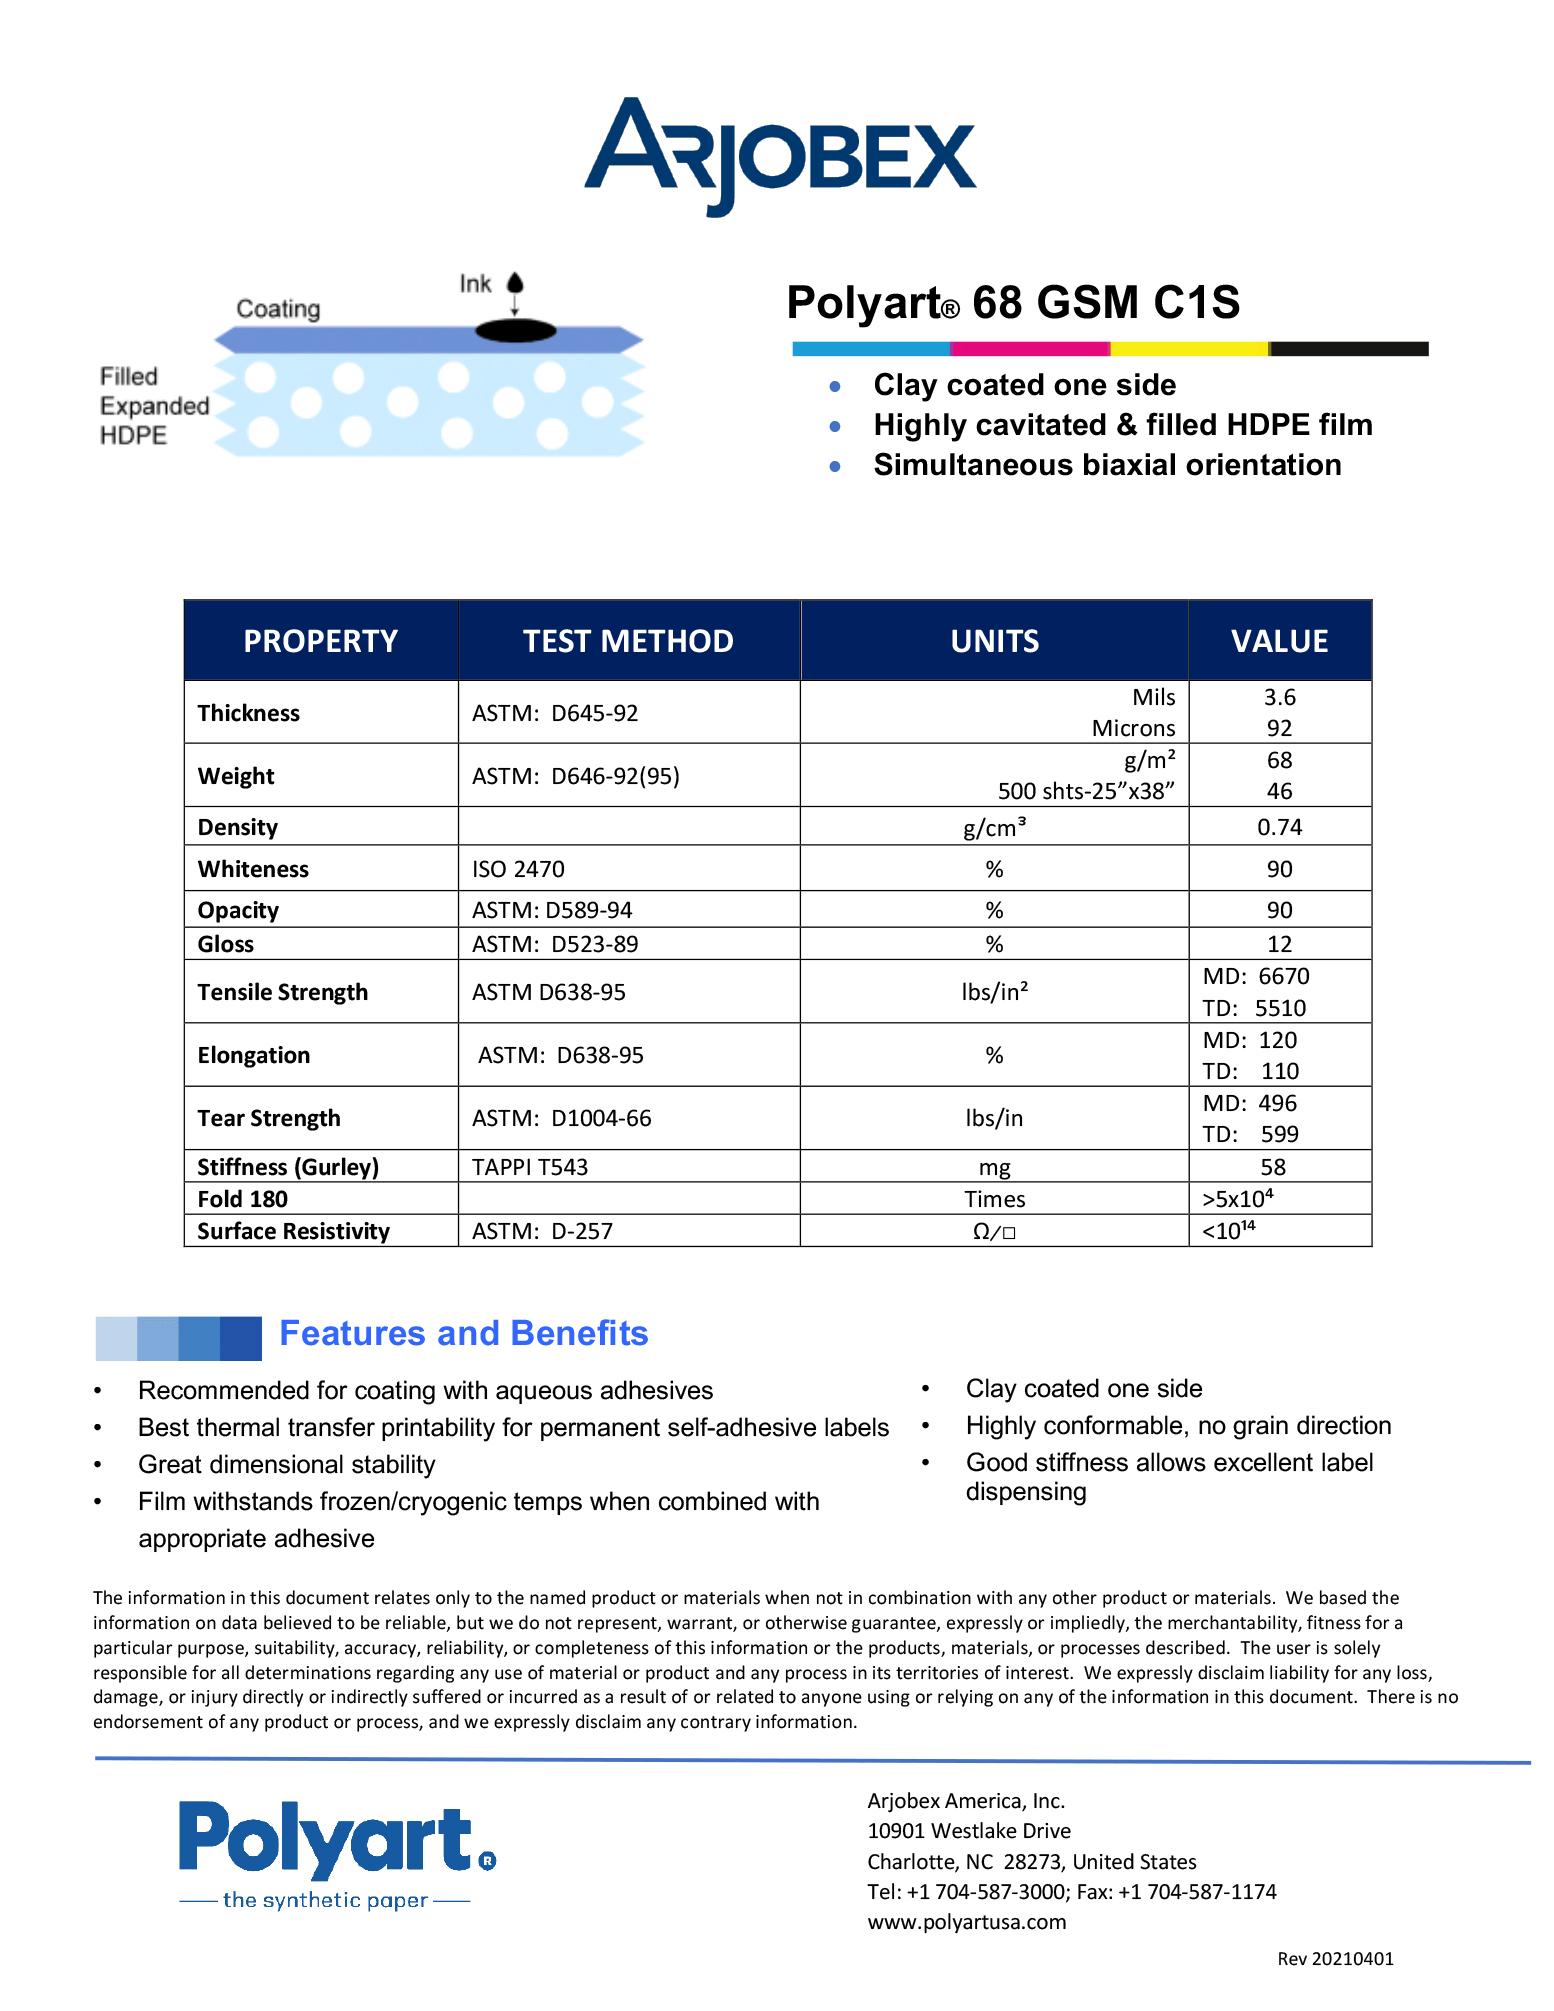 Arjobex Data Sheet_Polyart 68 GSM C1S